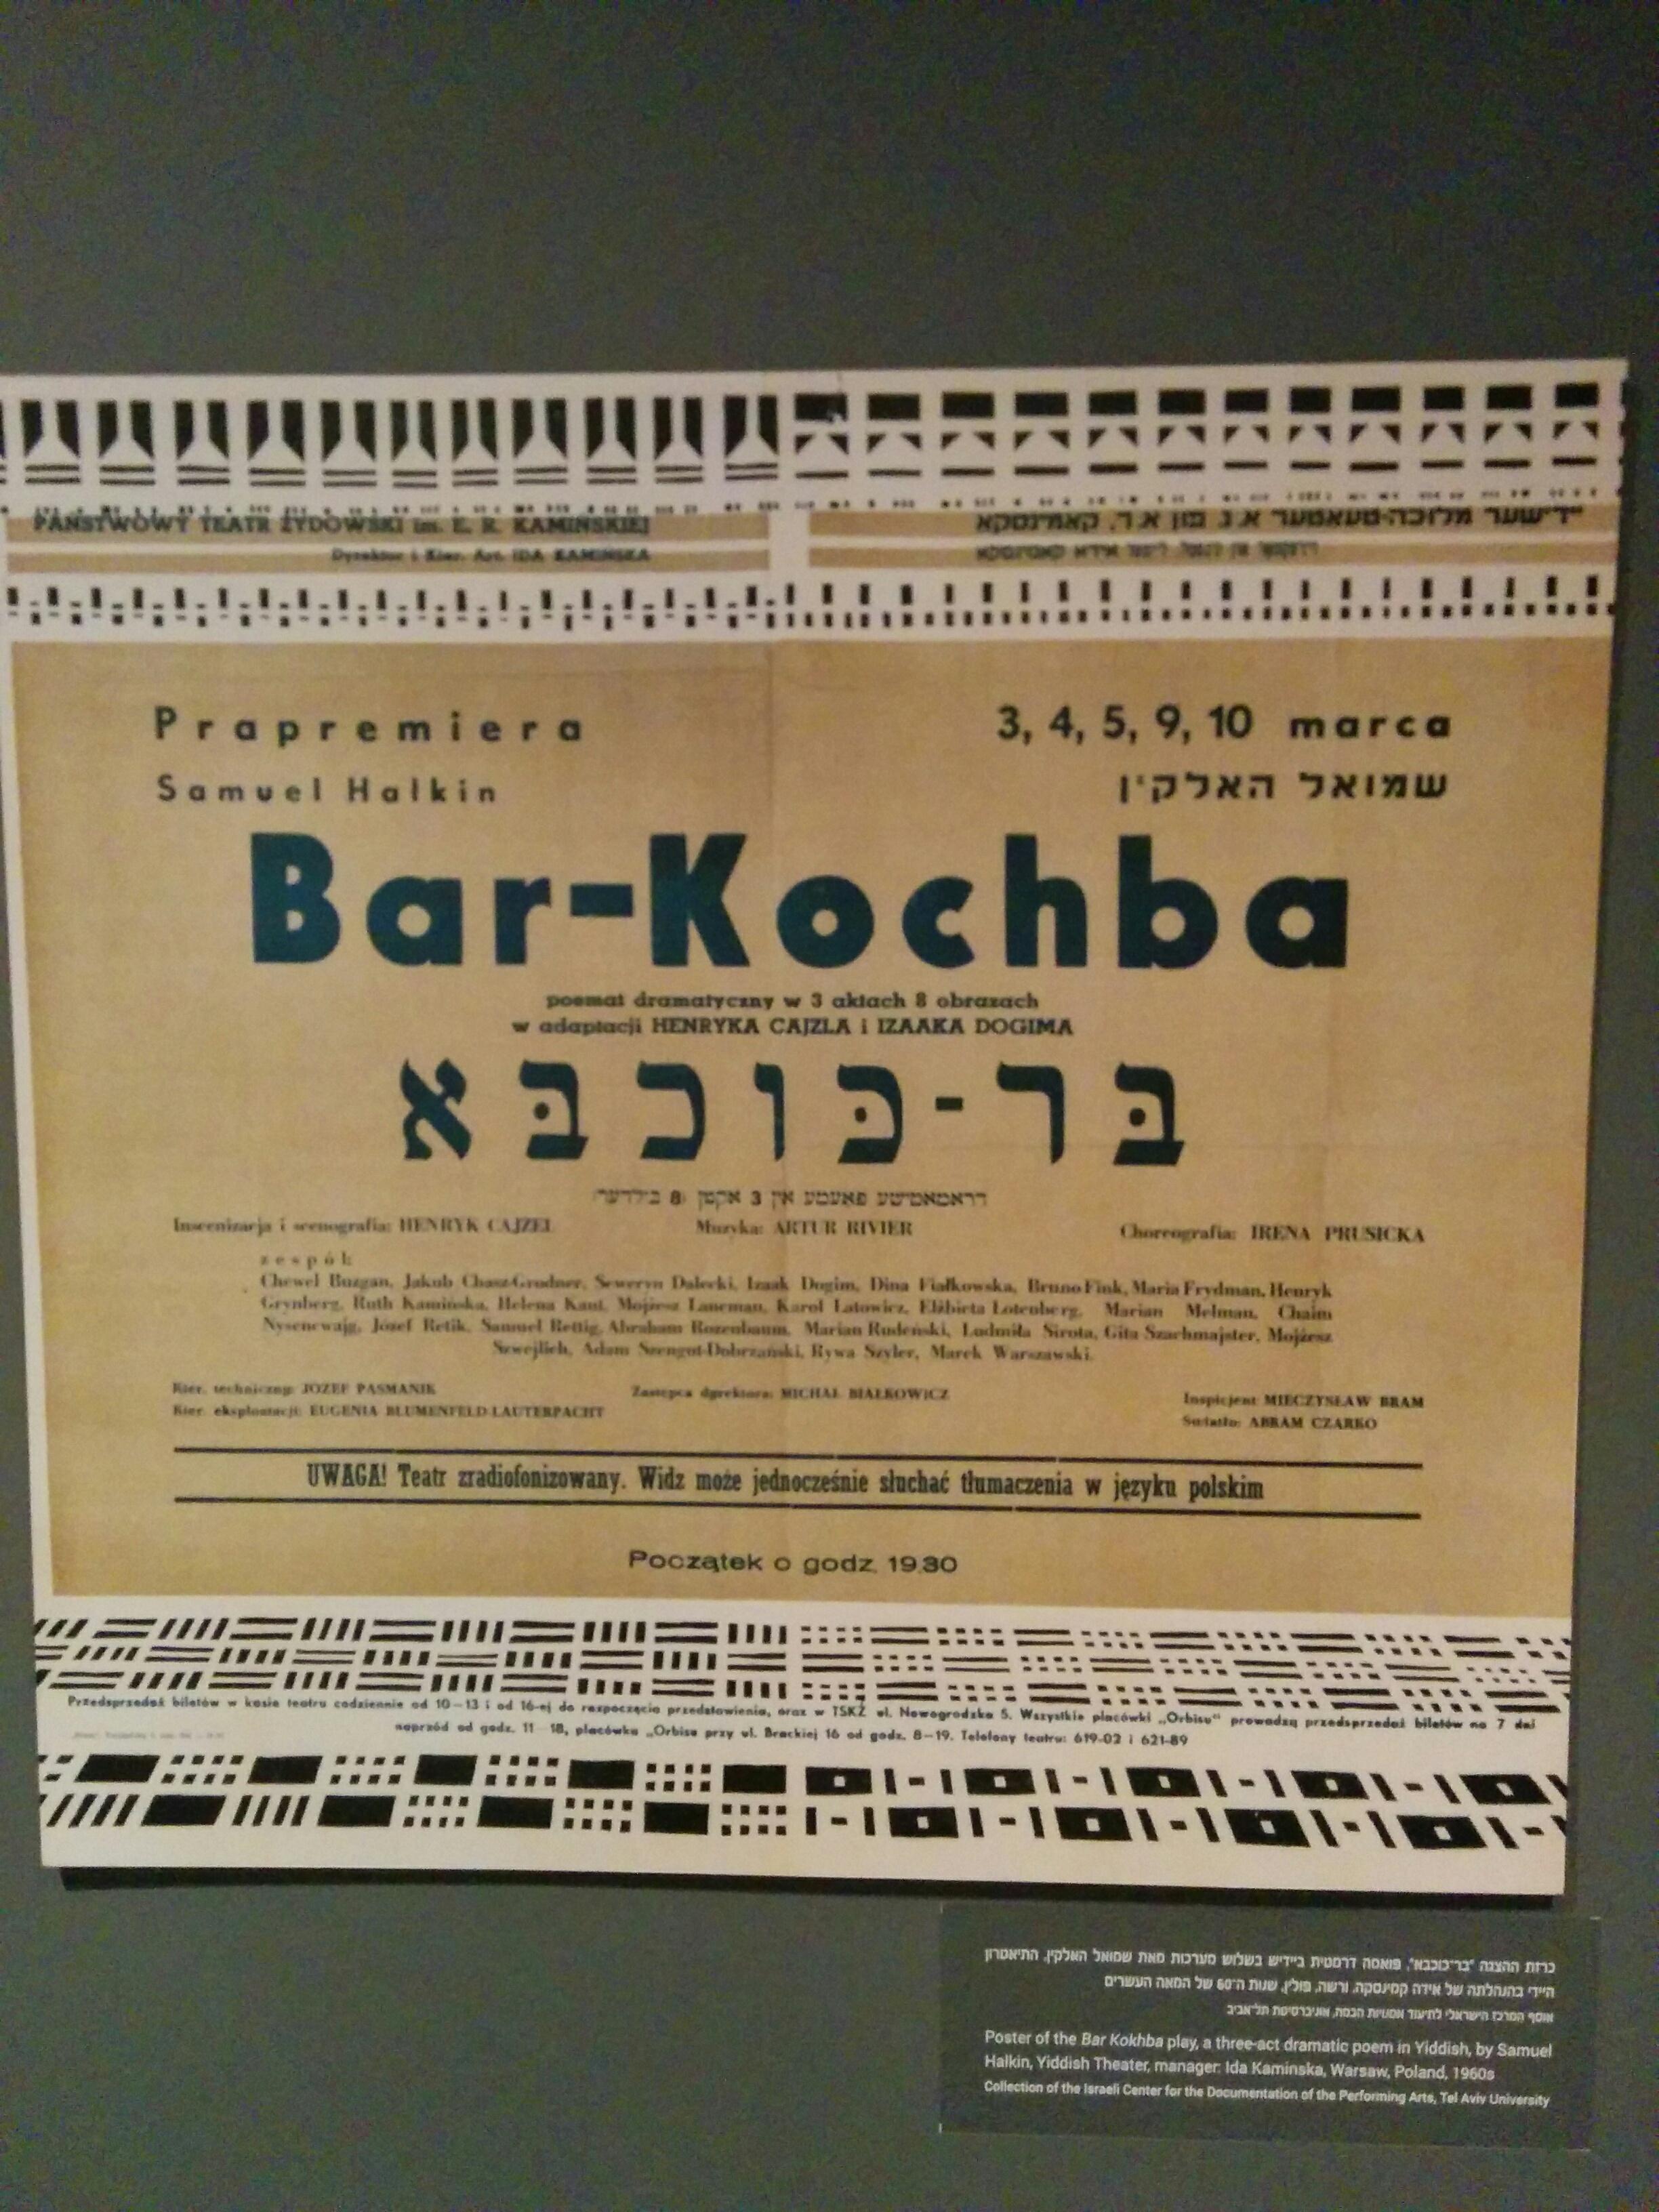 Hebrew play about Shimon Bar Kokhba - Eretz Israel Museum